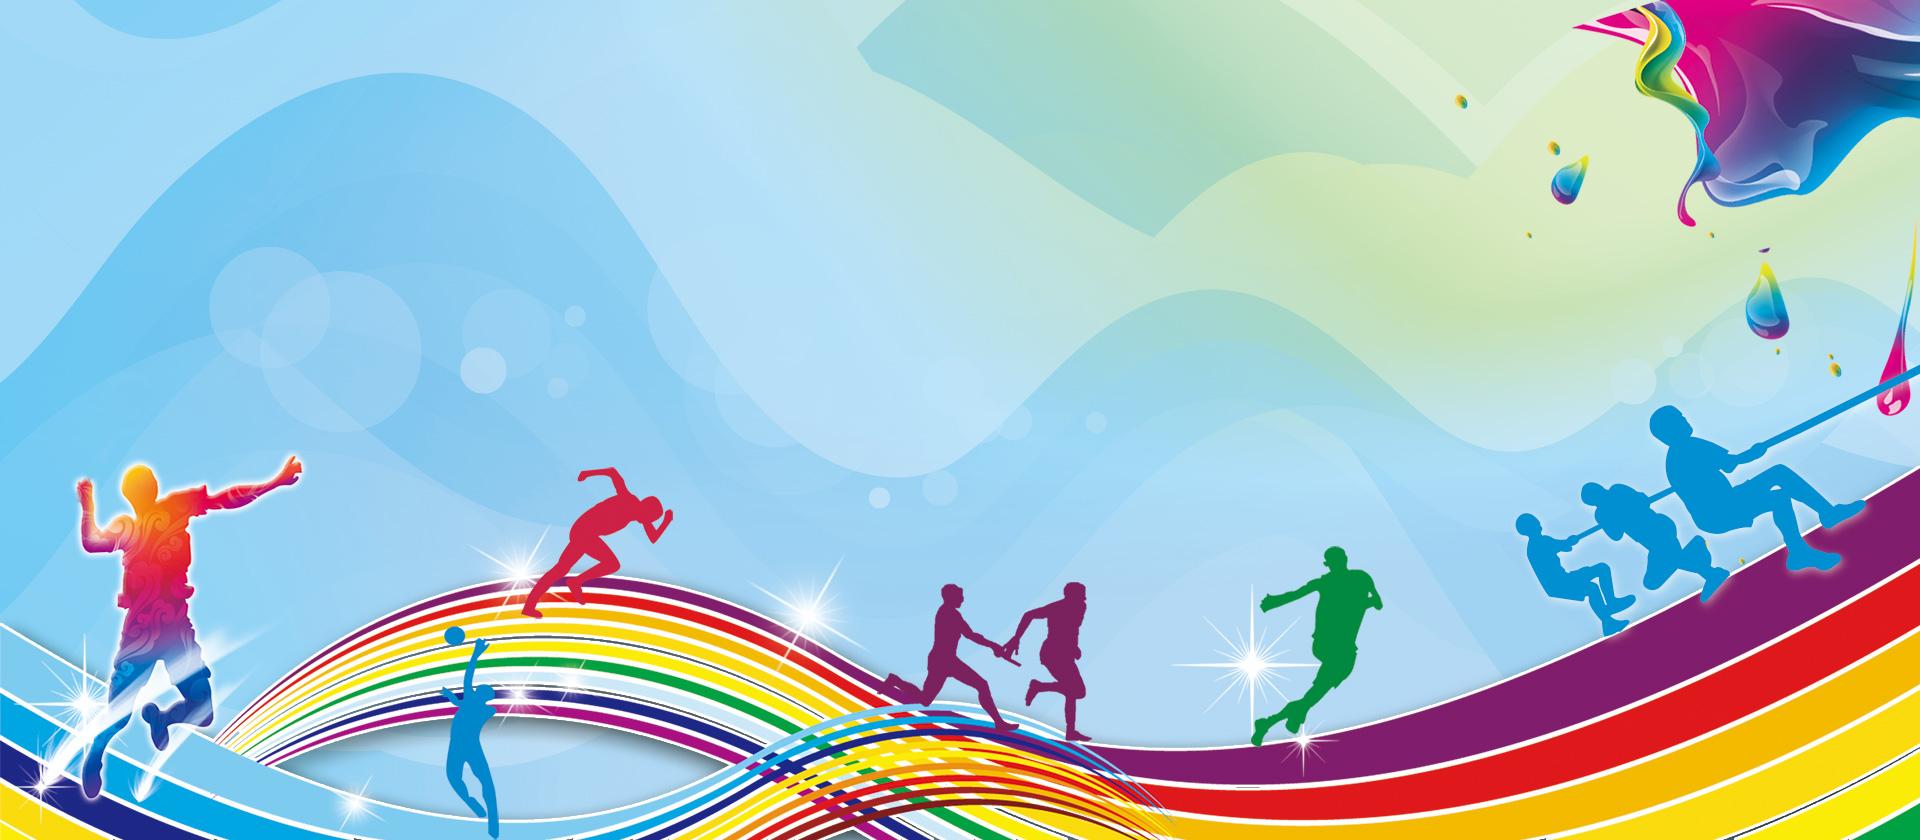 Background Games, Sports, Panels, Track Background Image